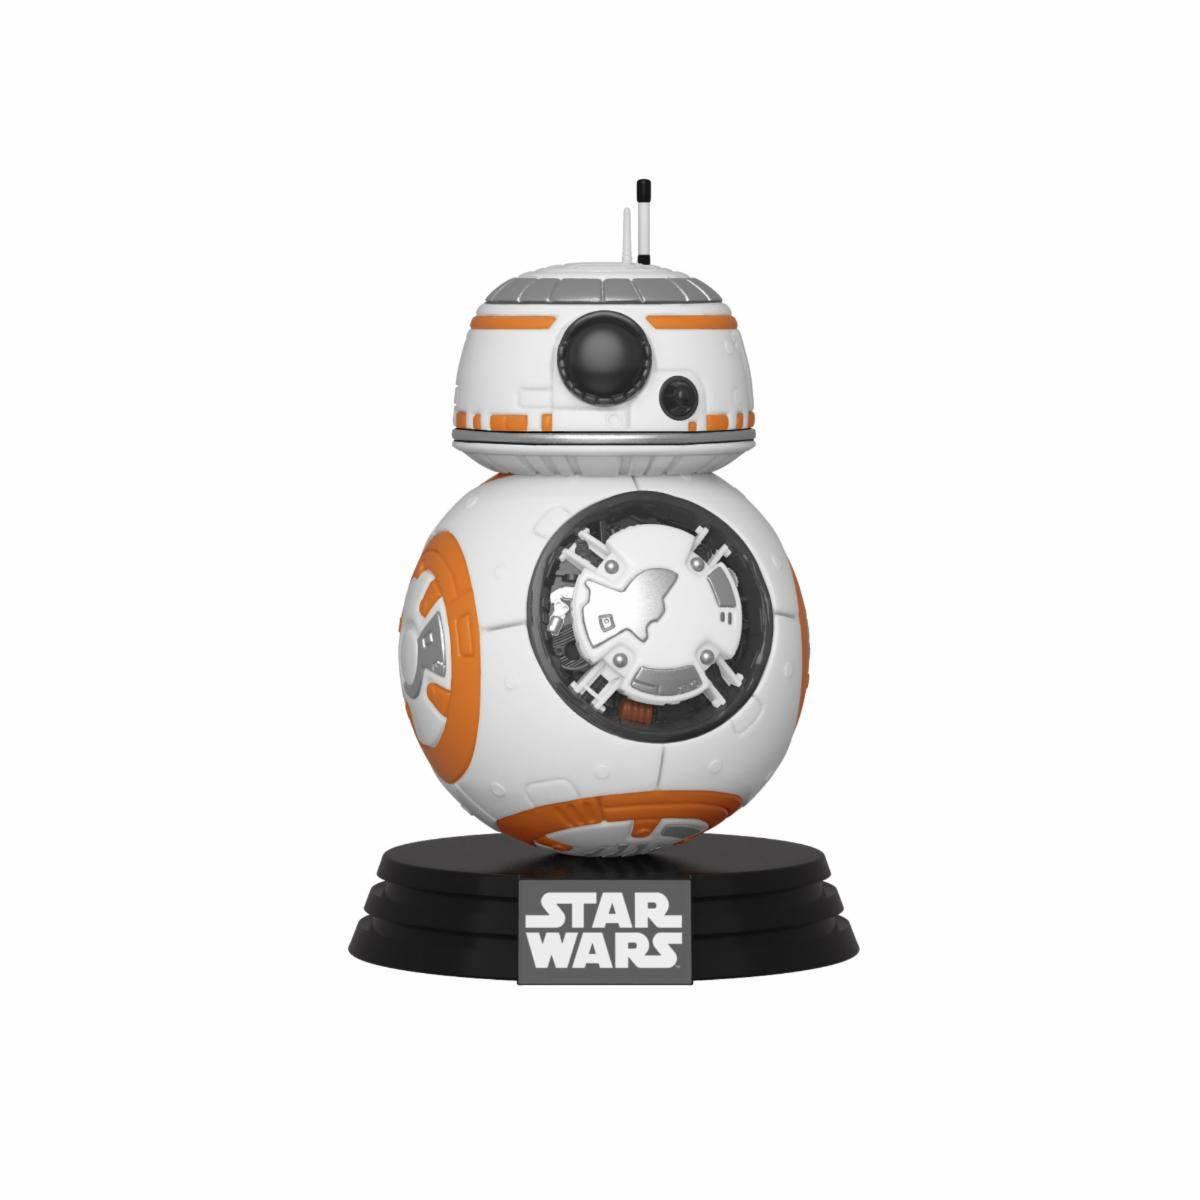 Star Wars Episode IX POP! Movies Vinyl Figure BB-8 9 cm